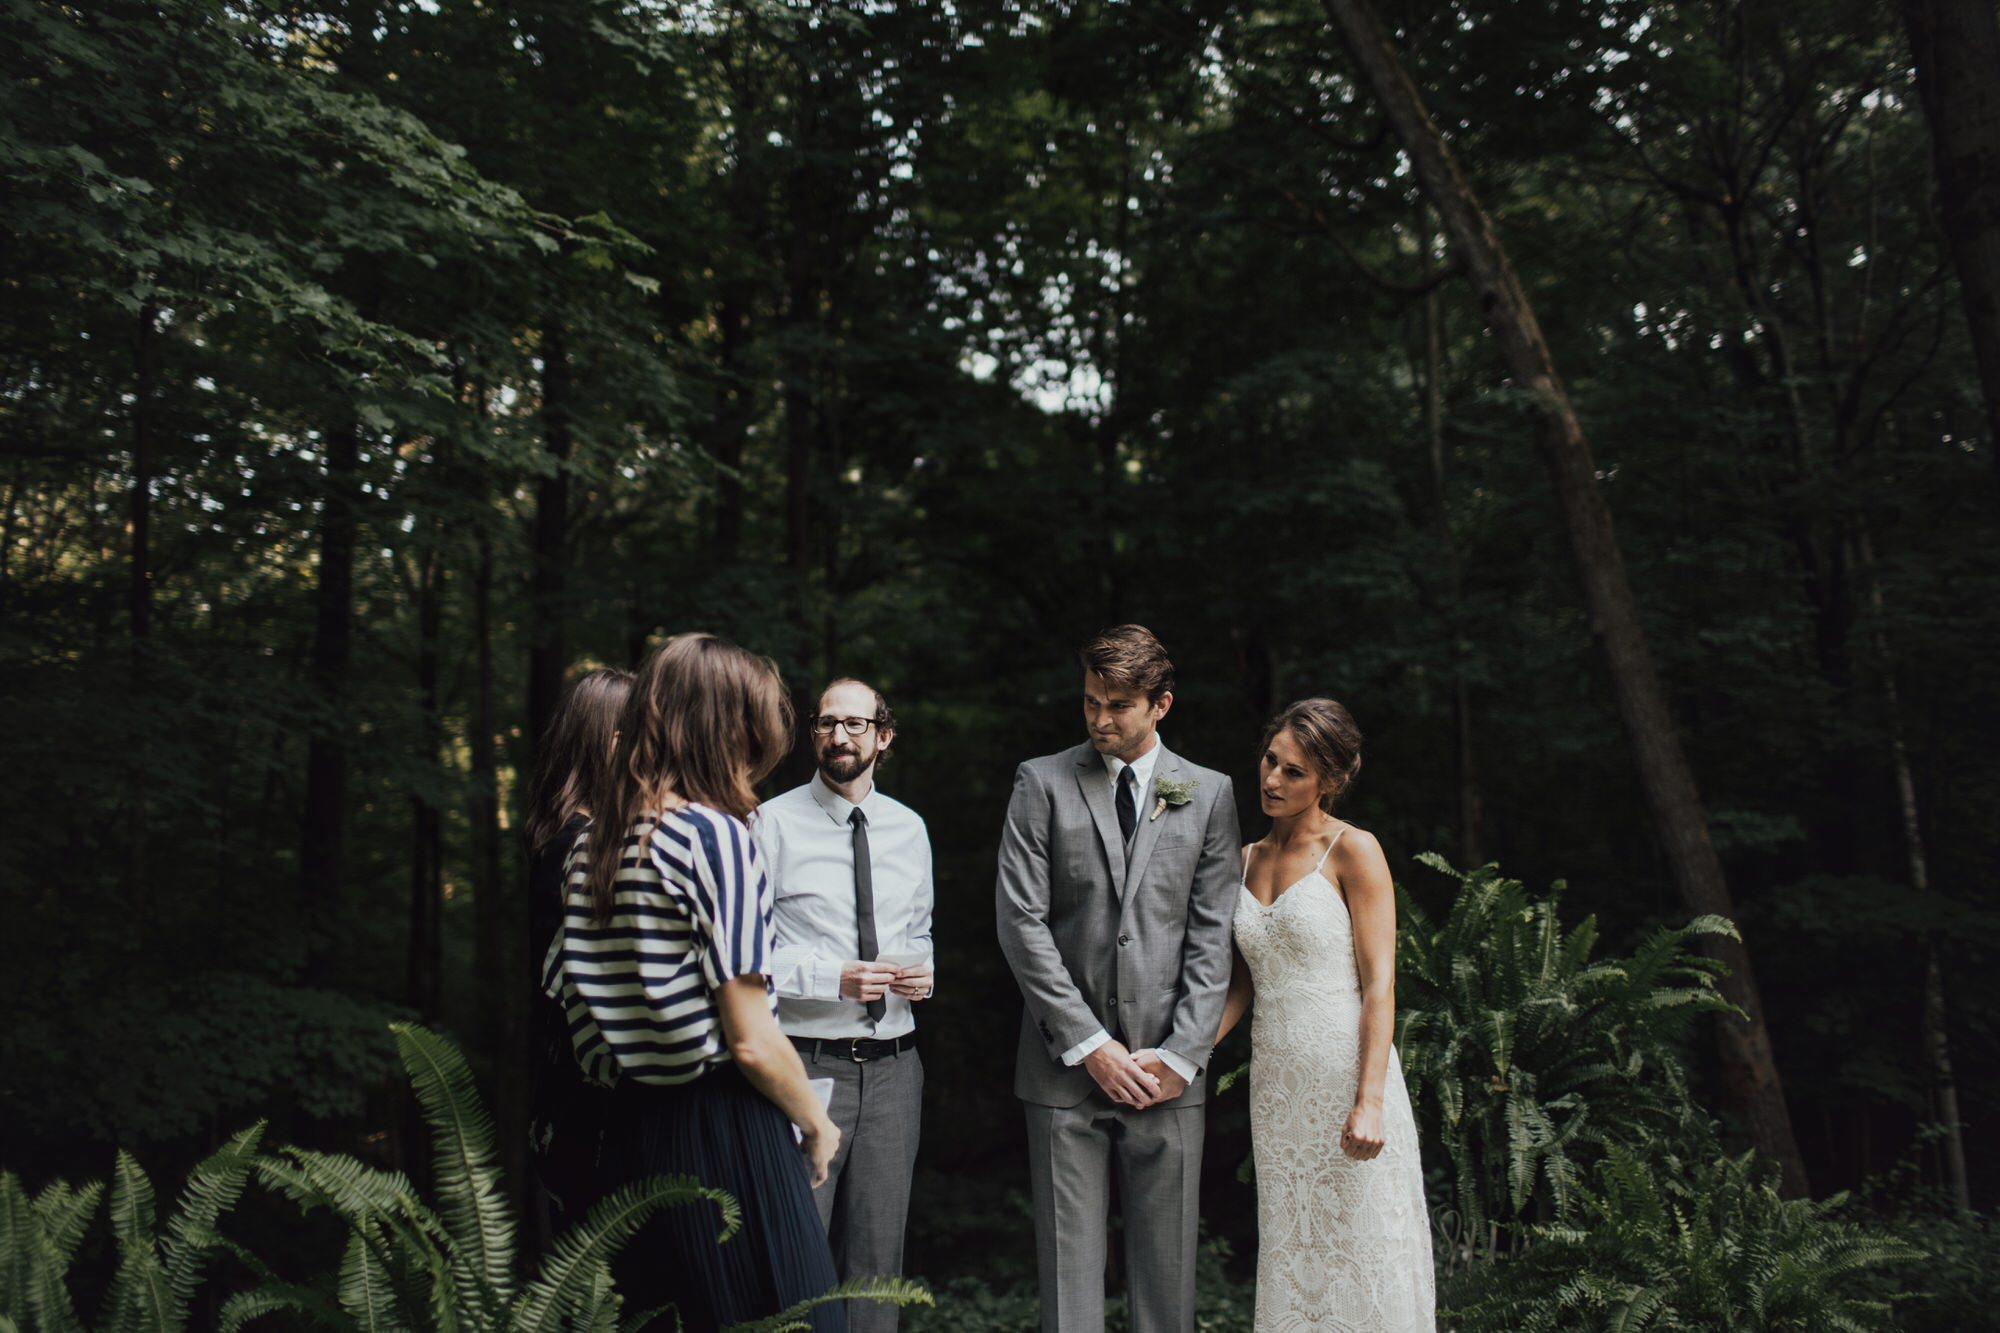 emily-aaron-rochester-new-york-wedding-photographer-69.JPG